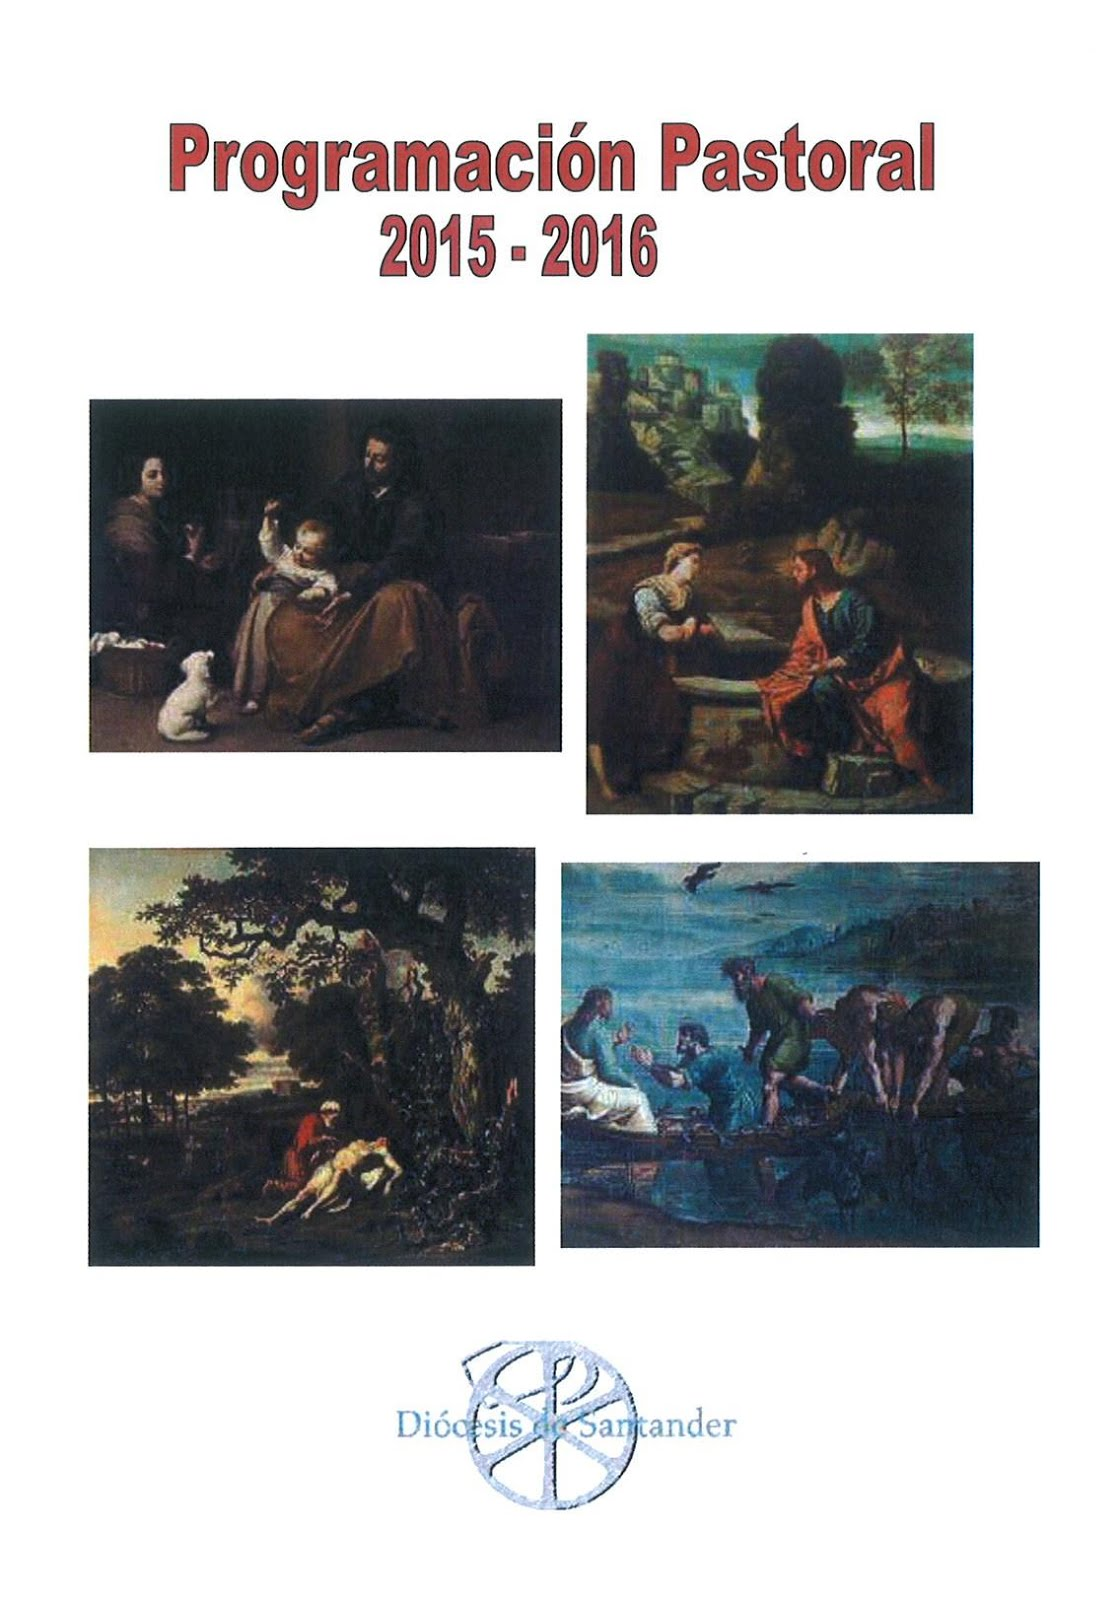 PROGRAMACION PASTORAL DIOCESANA 2015-2016